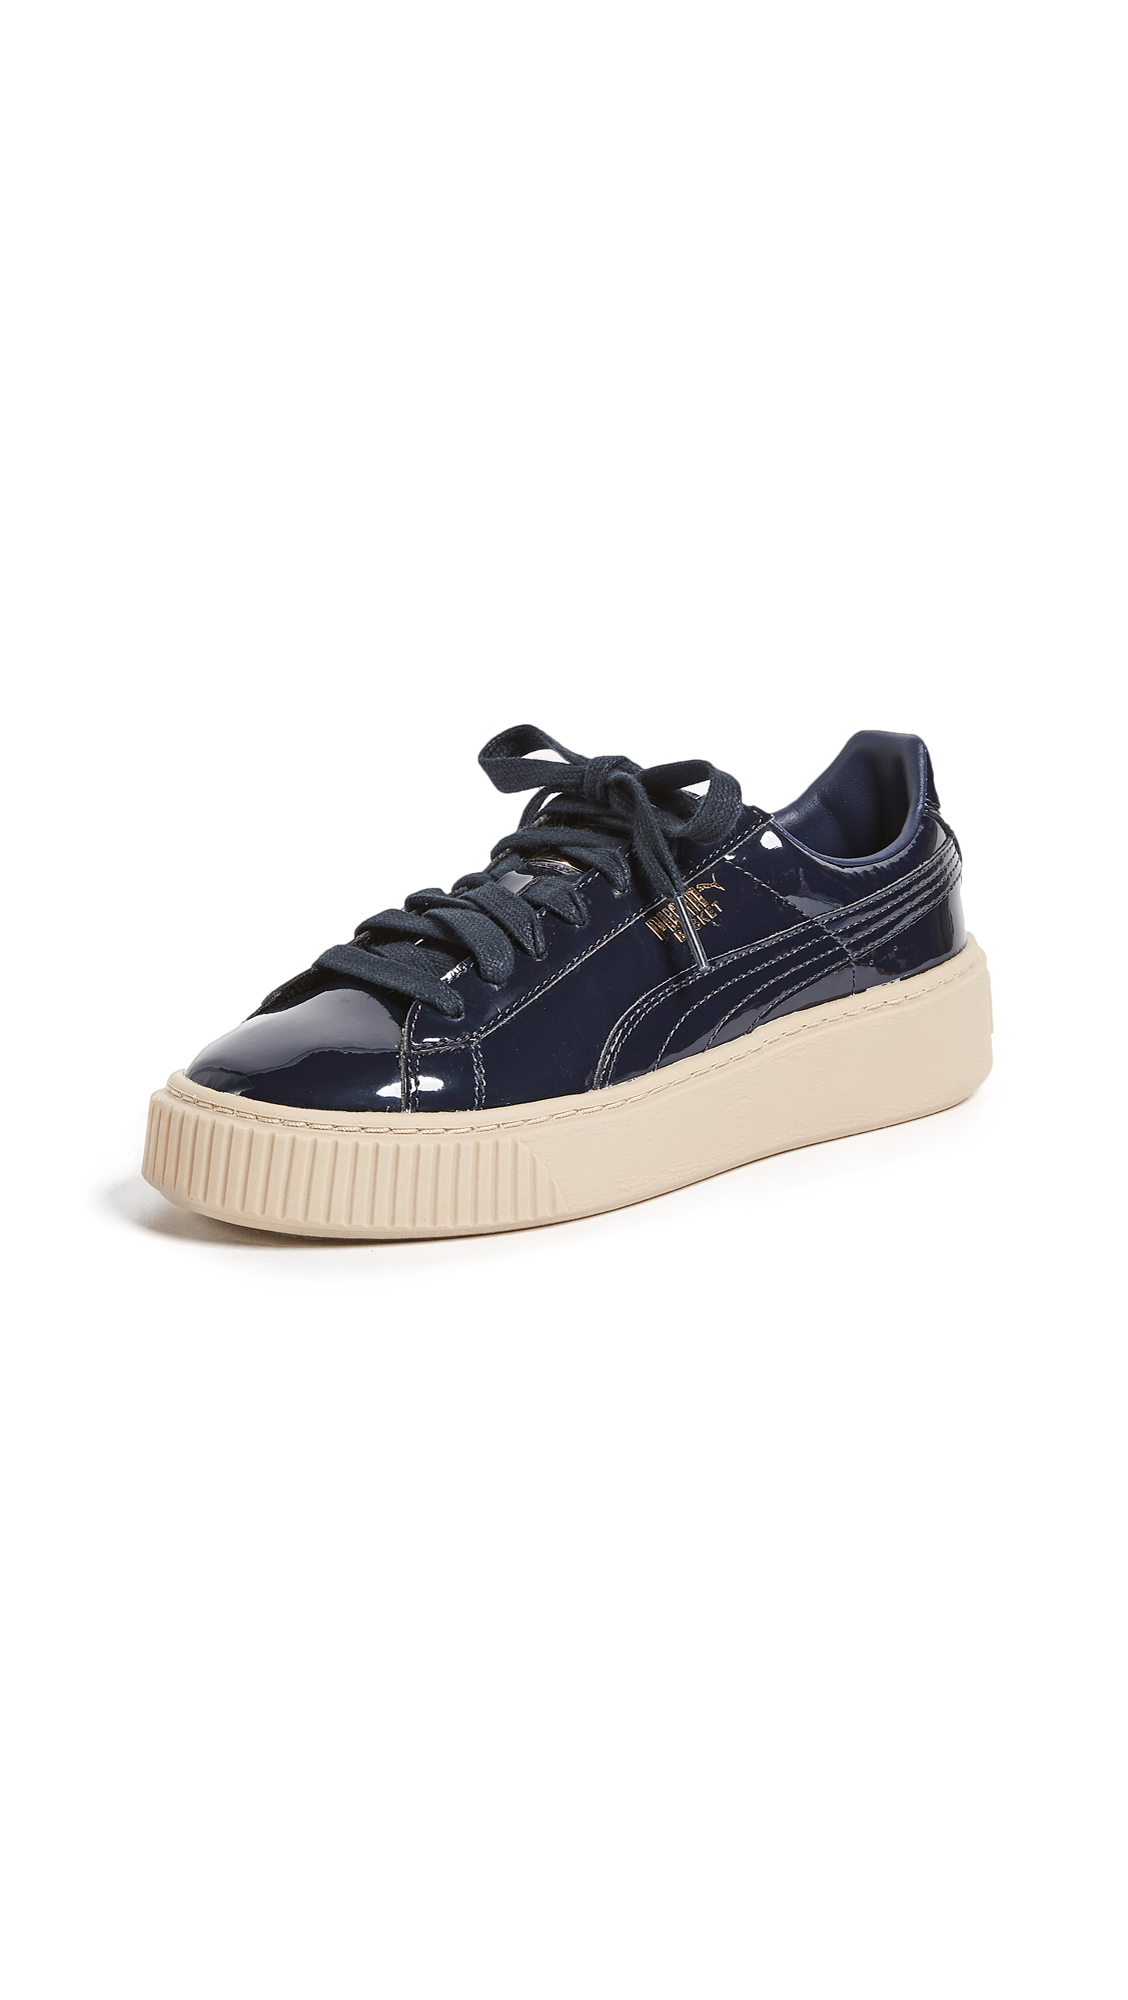 PUMA Basket Platform Patent Sneakers - Navy